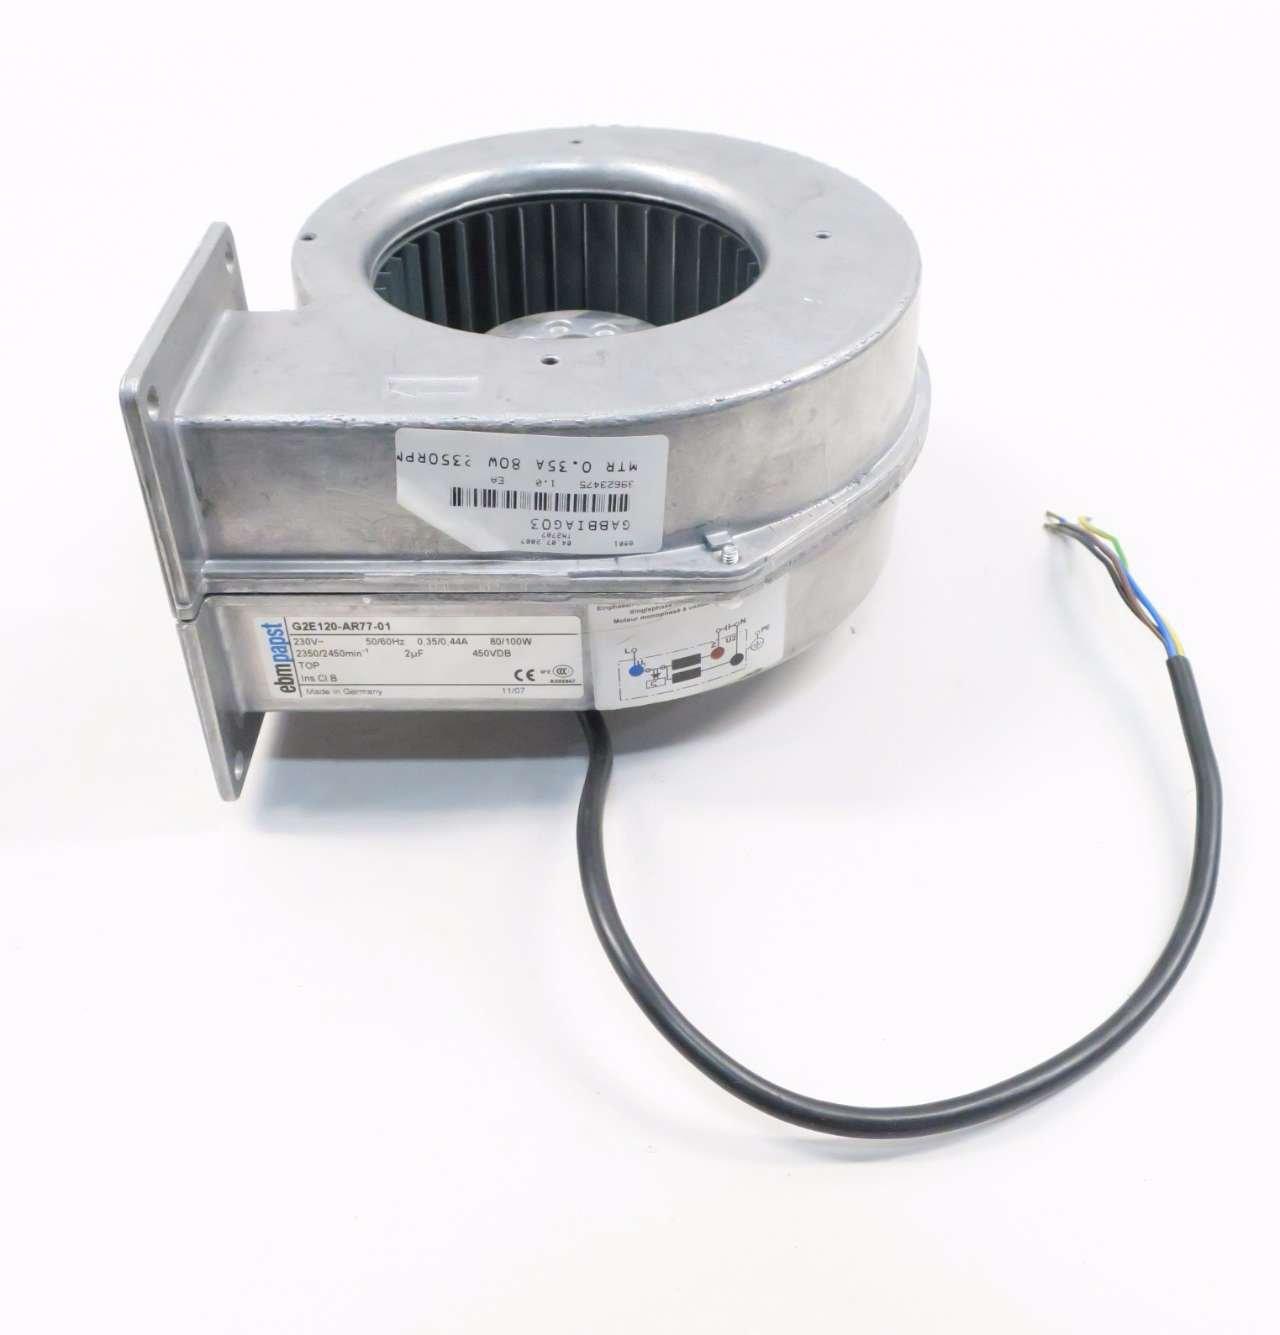 EBM Papst G2E120-AR77-01 Industrie Ventilateur en aluminium 230 V